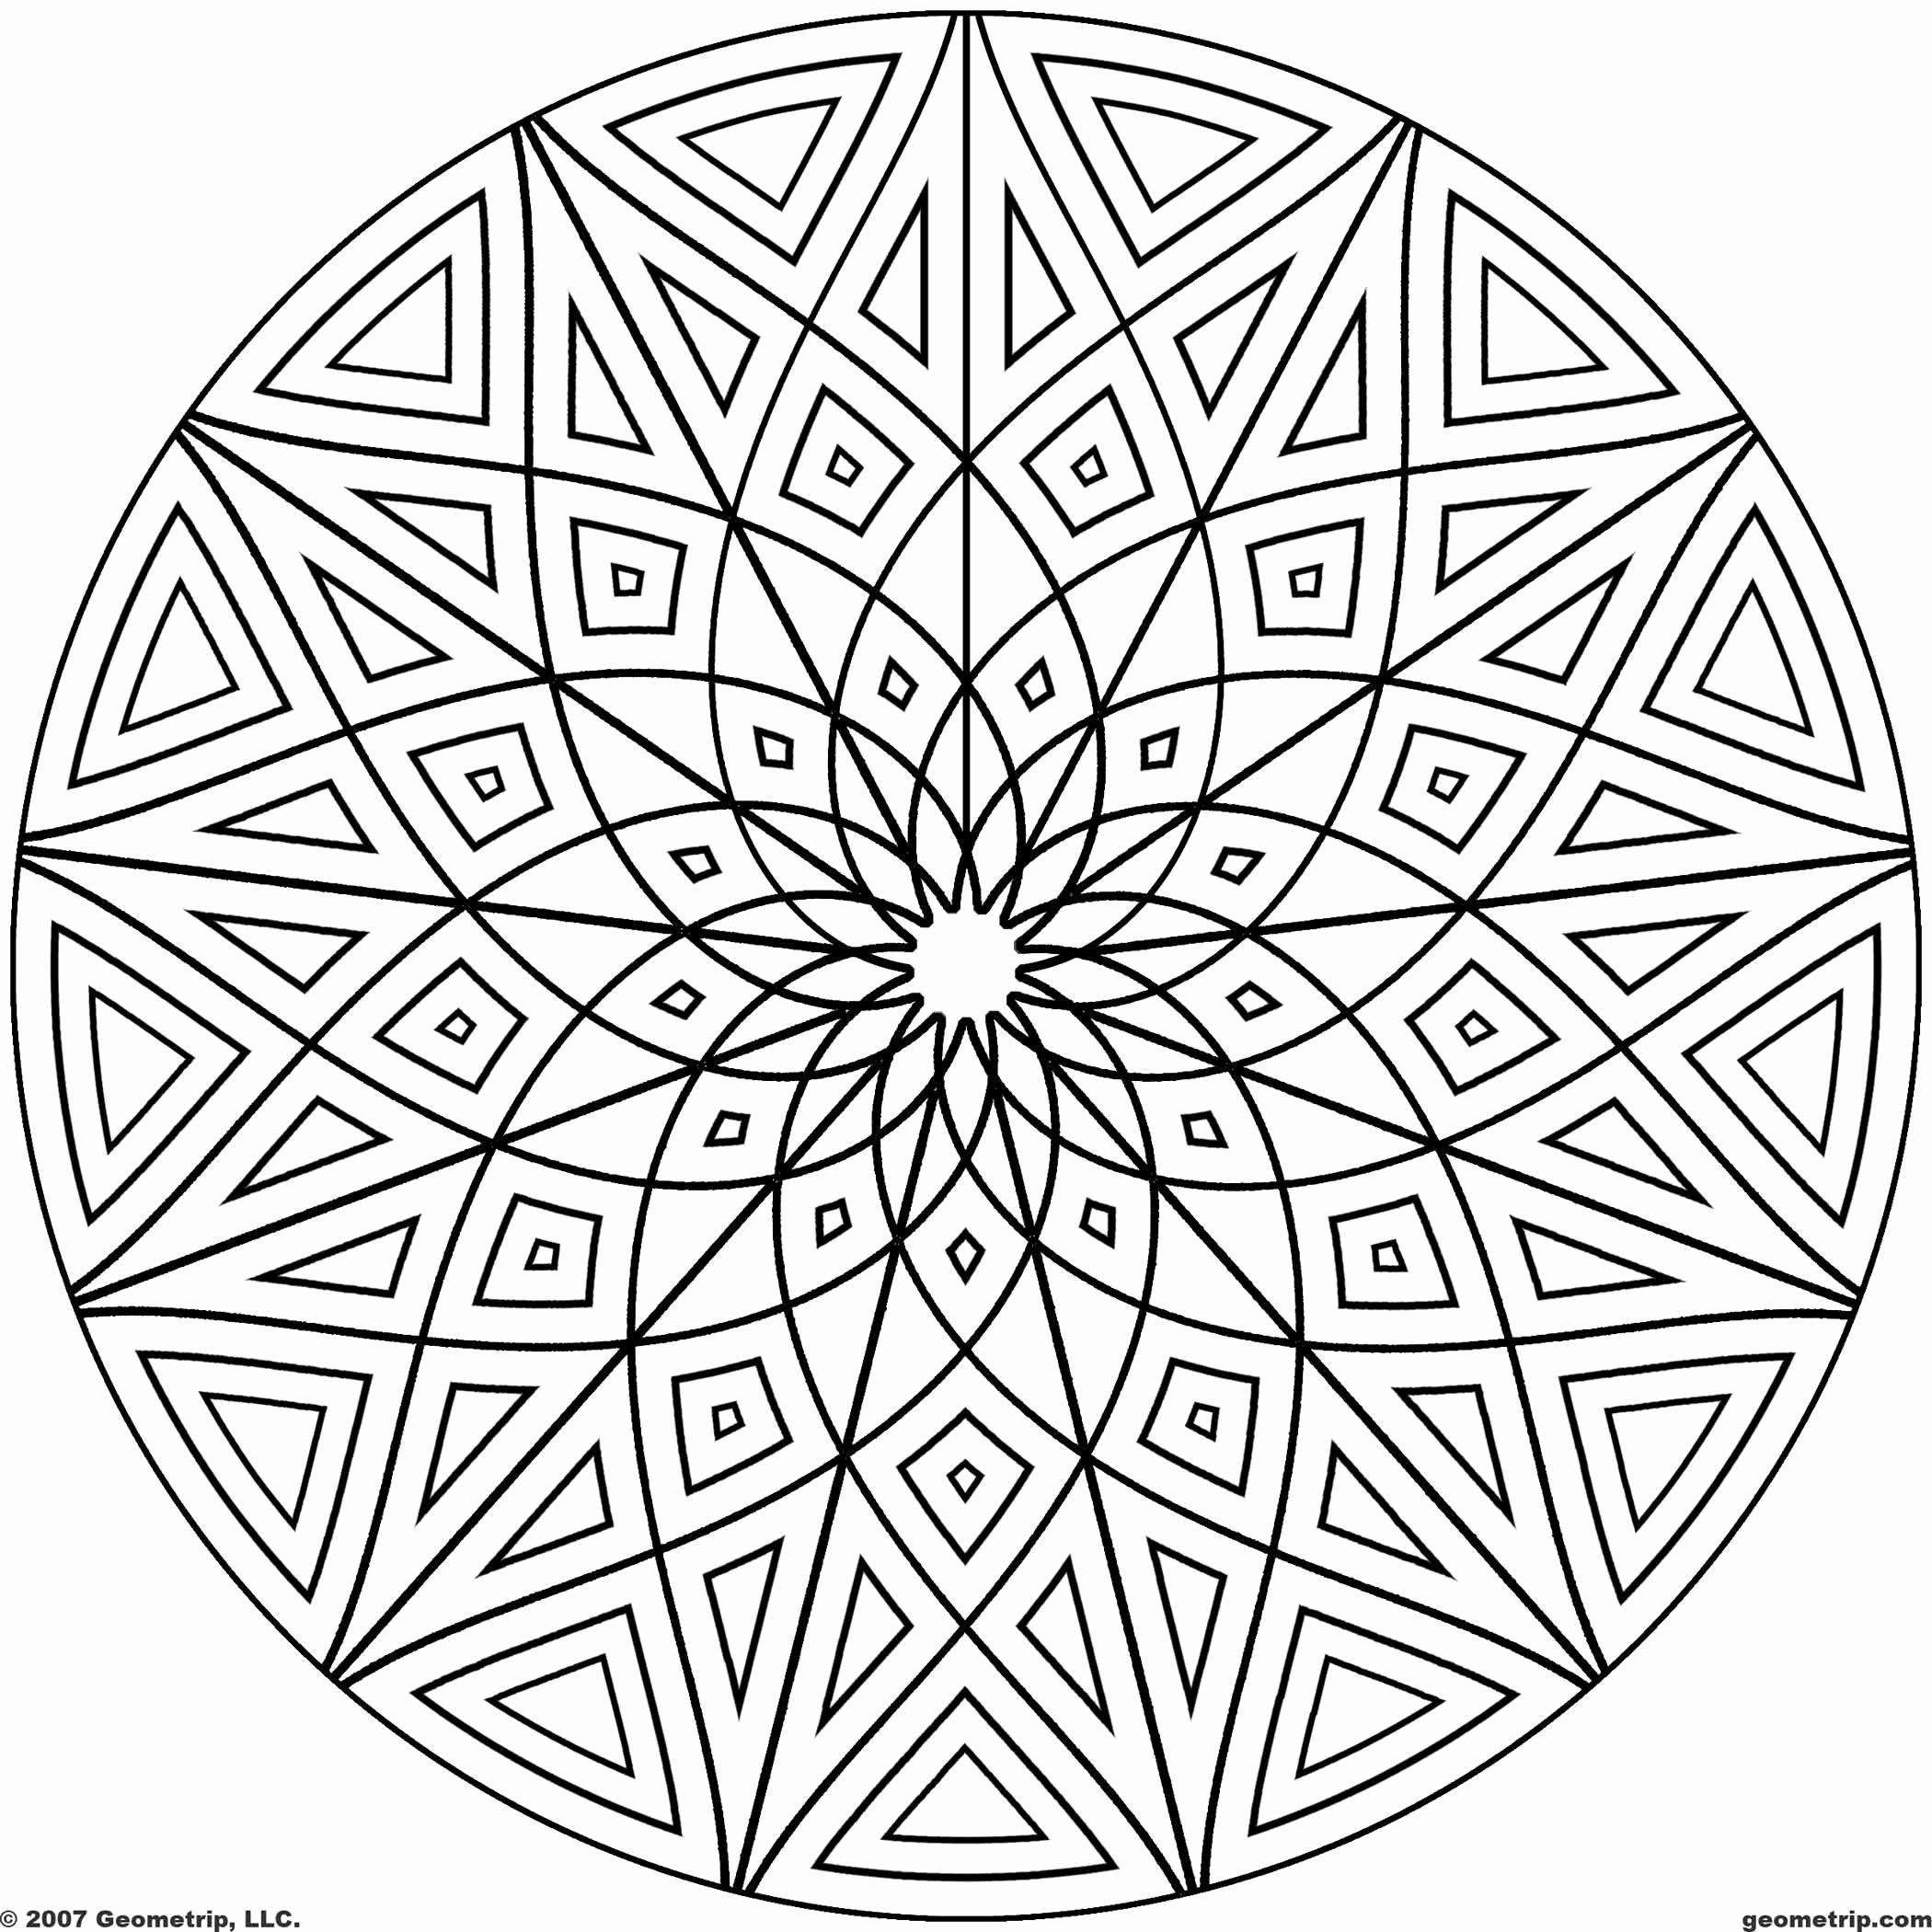 Rangoli Coloring Design Unique Printable Coloring Pages Designs Geometric Coloring Pages Mandala Coloring Pages Geometric Patterns Coloring